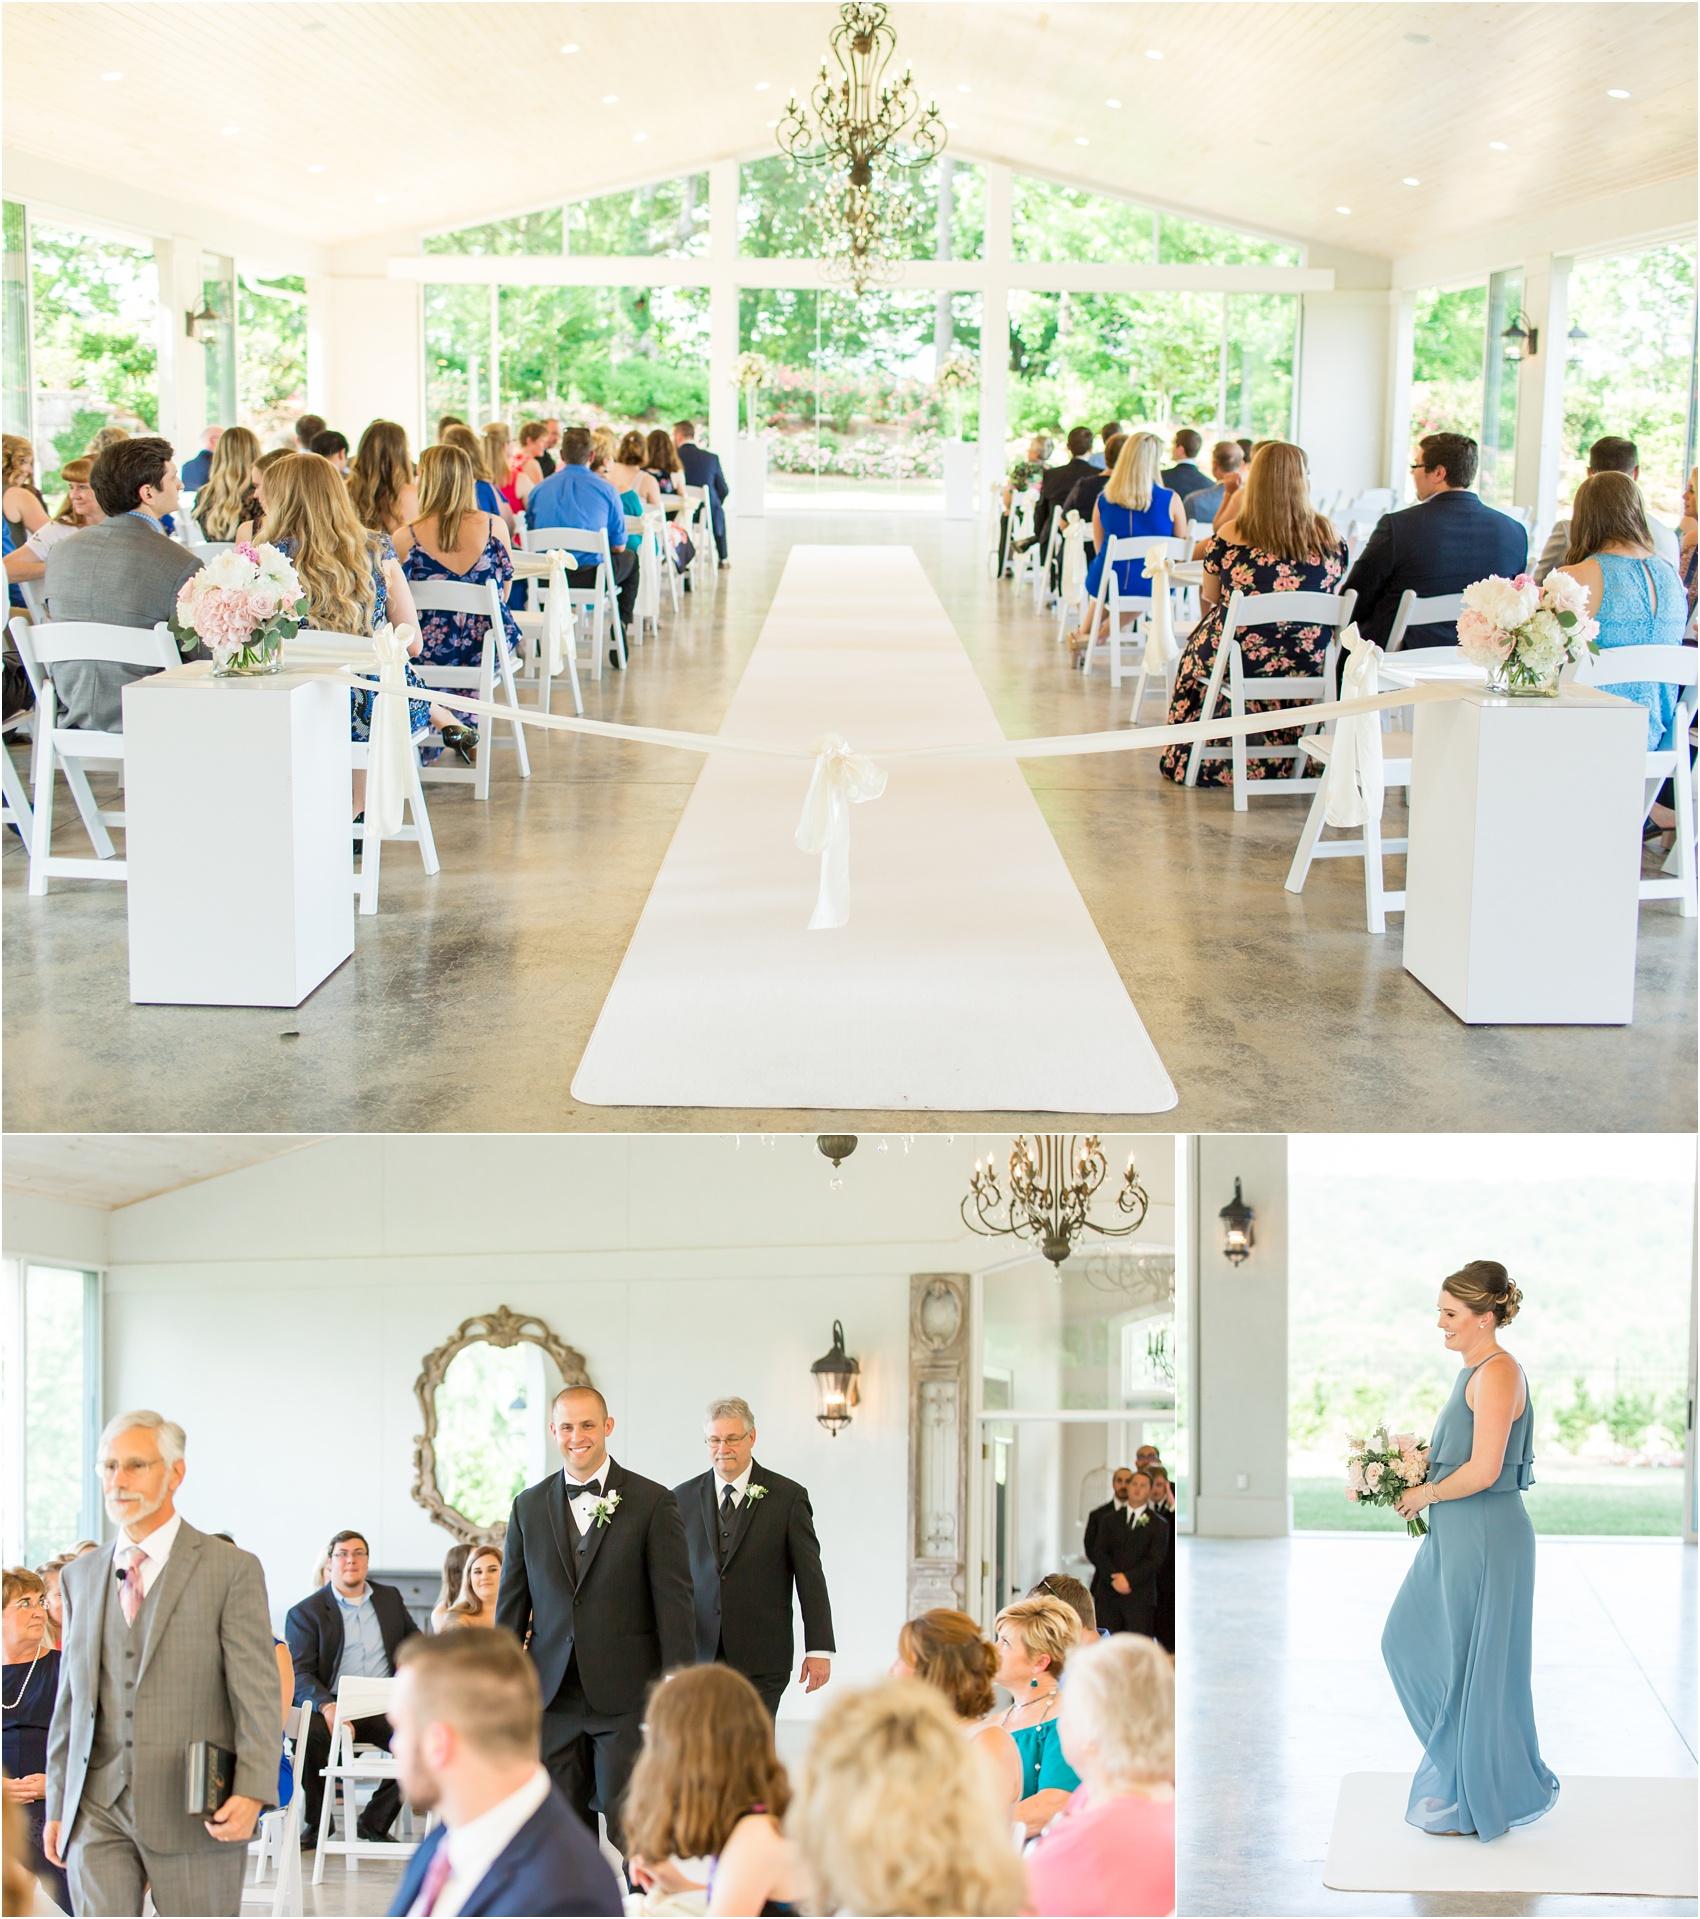 Savannah Eve Photography- Nutt Wedding- Blog-62.jpg